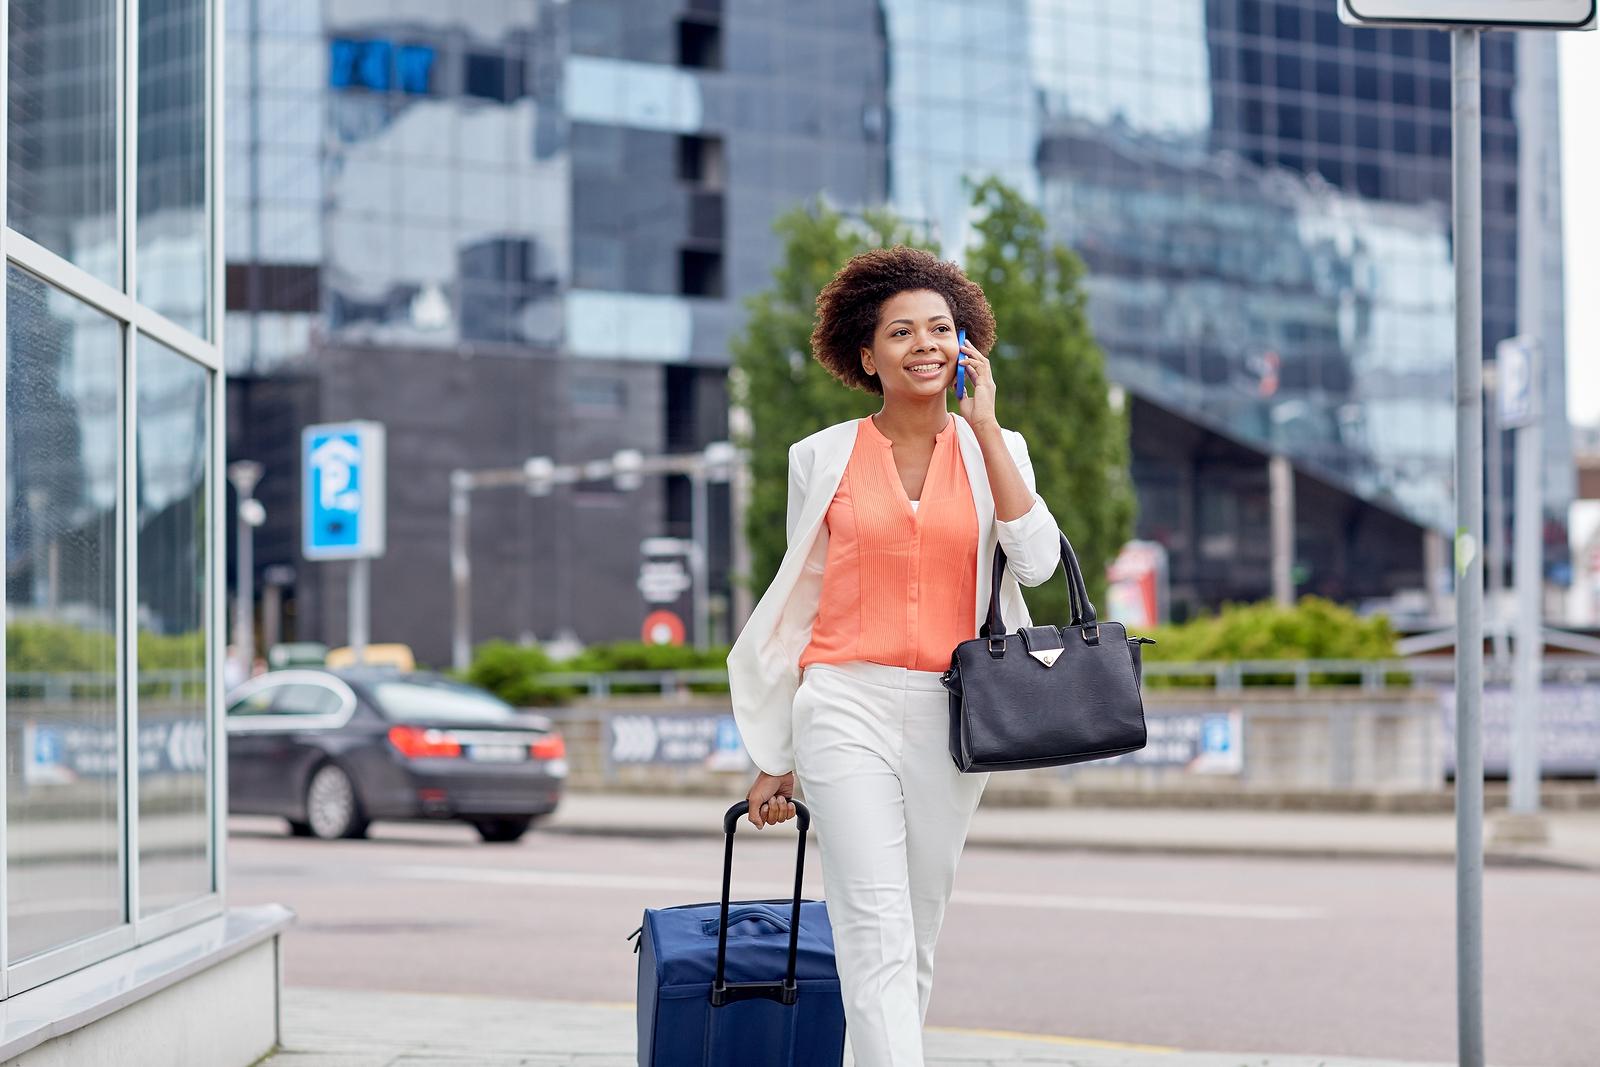 bigstock-travel-business-trip-people--97092779.jpg